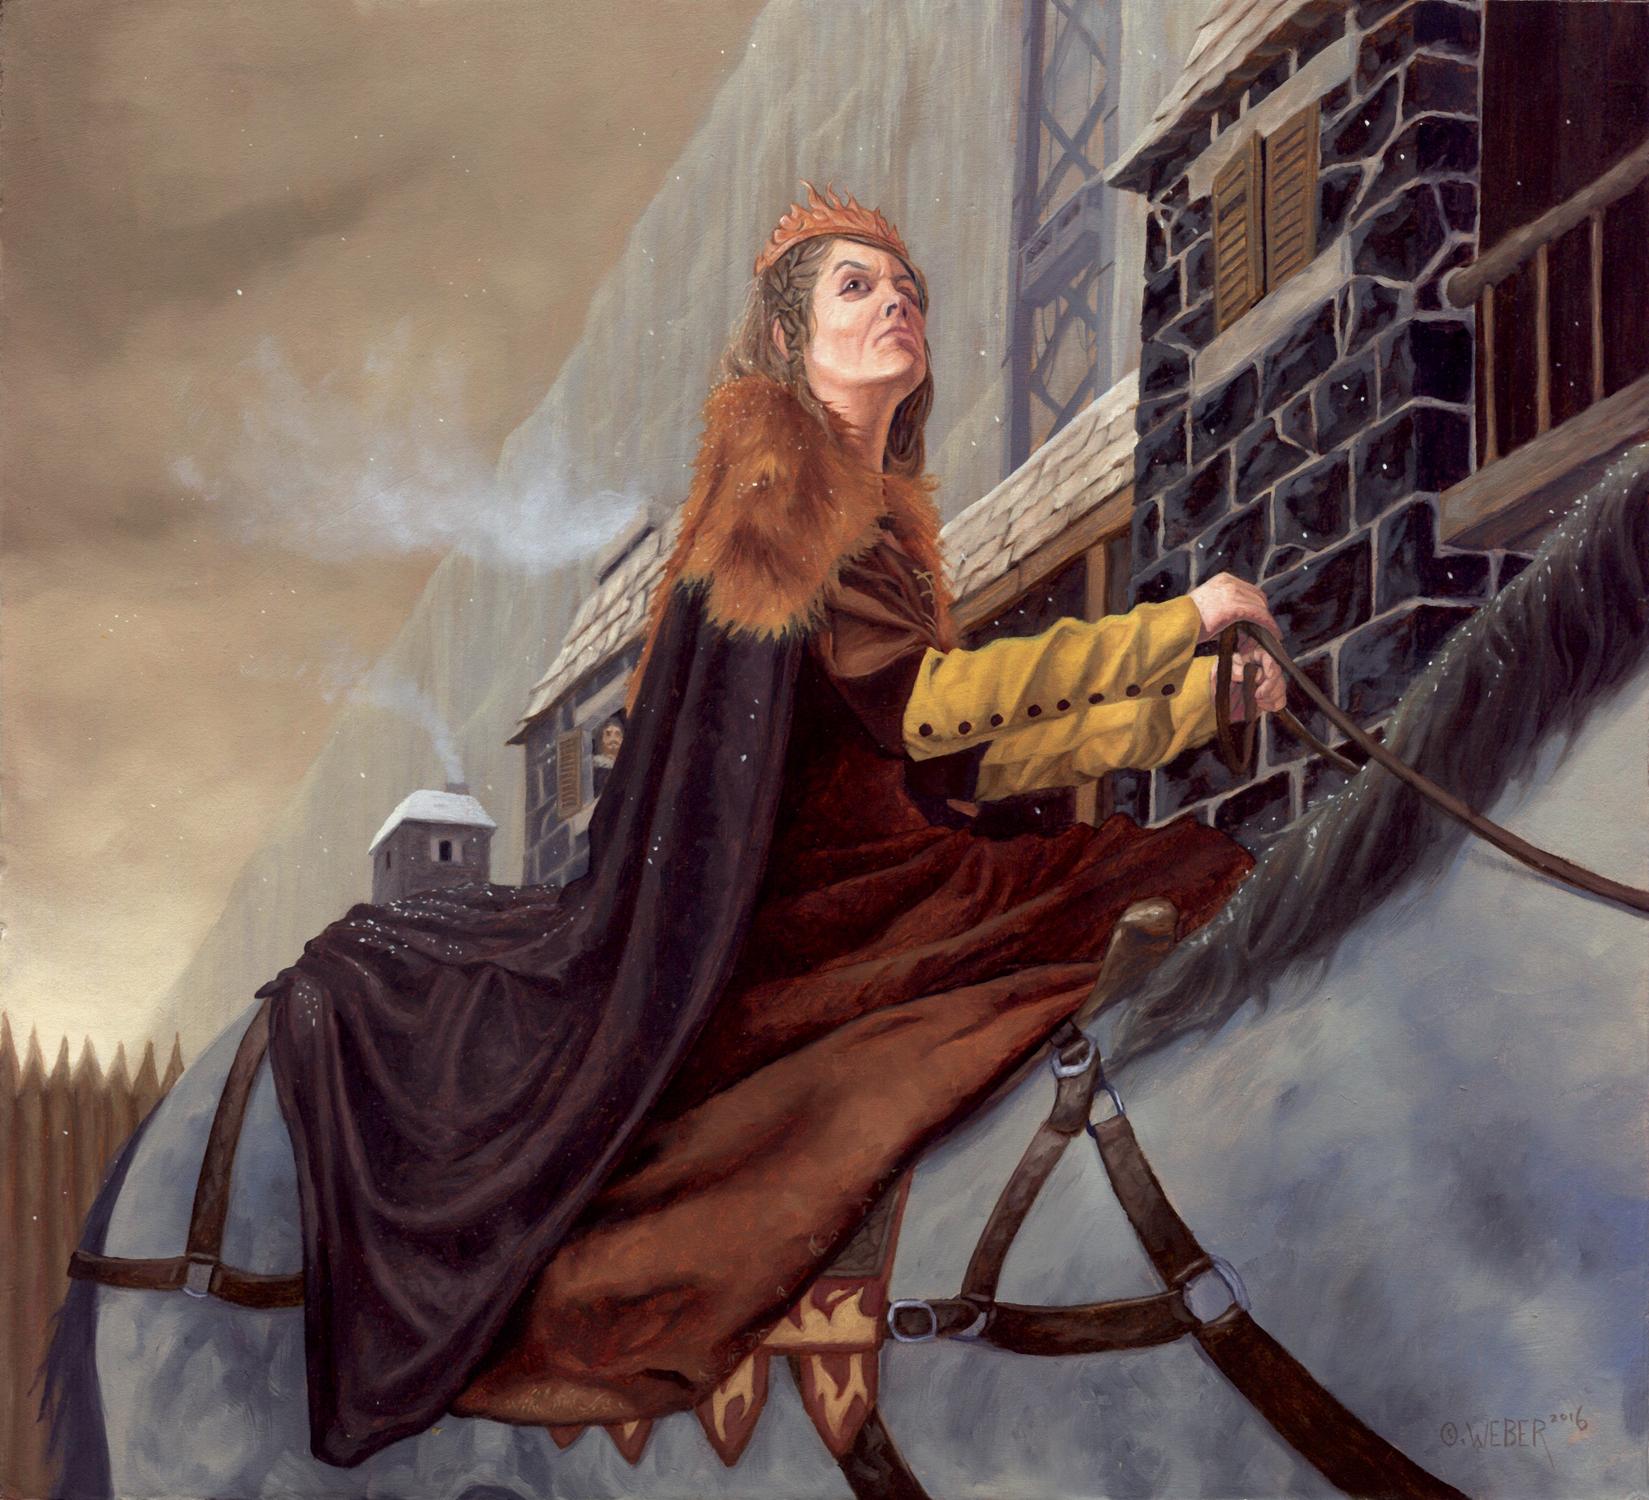 Selyse Baratheon Artwork by Owen Weber